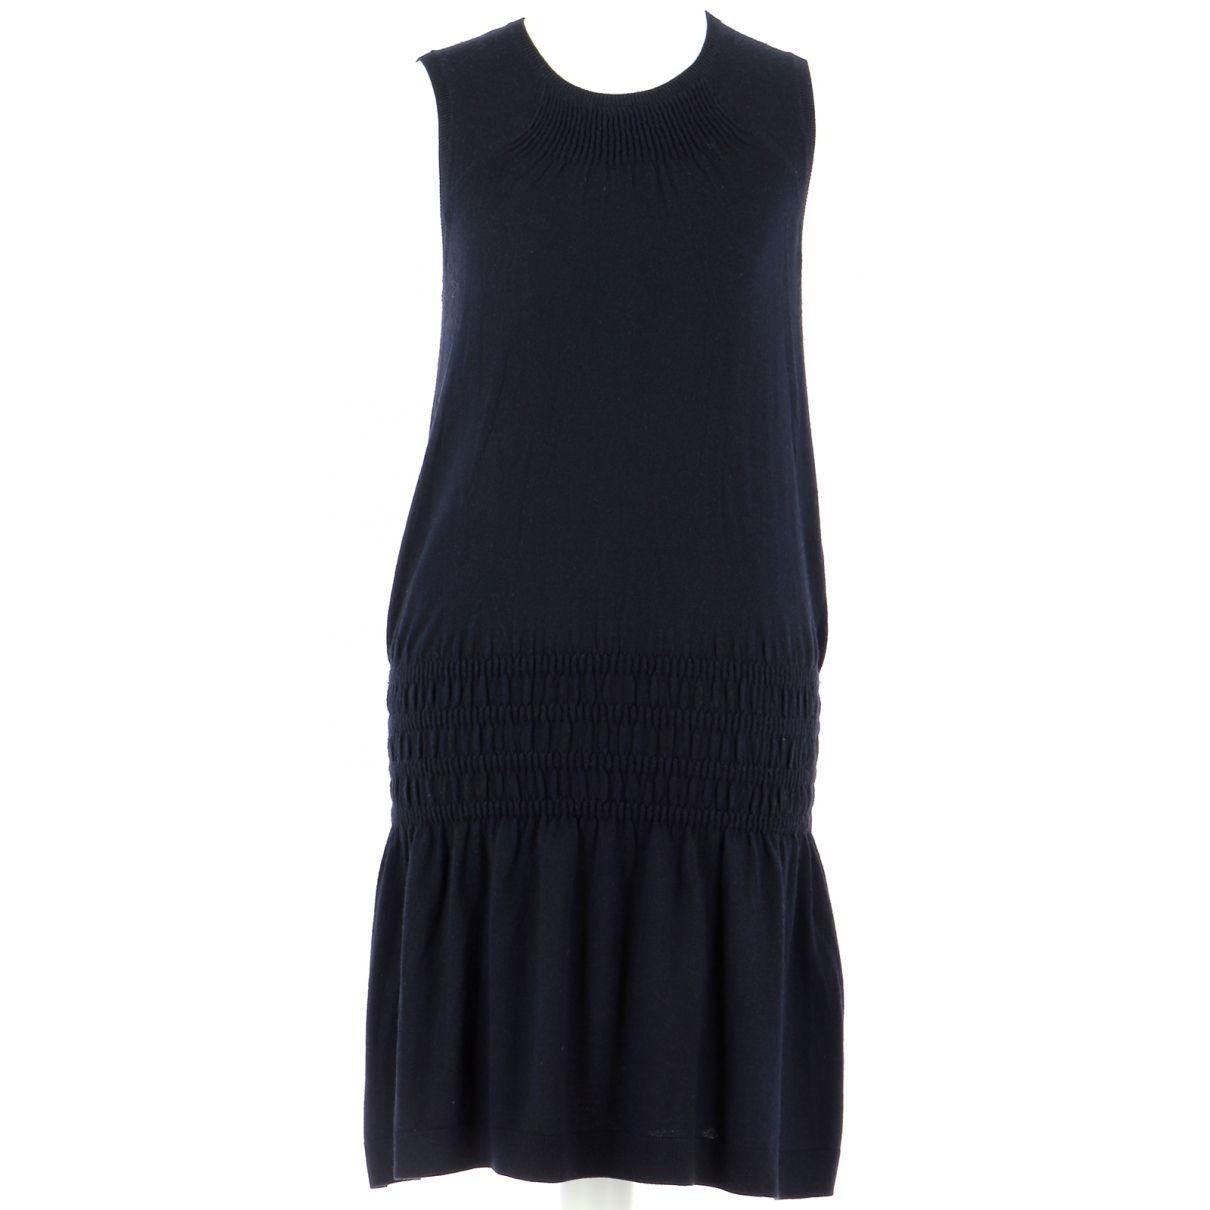 Robes Vanessa Bruno Athe pour femme en laine. Taille 36 FR.